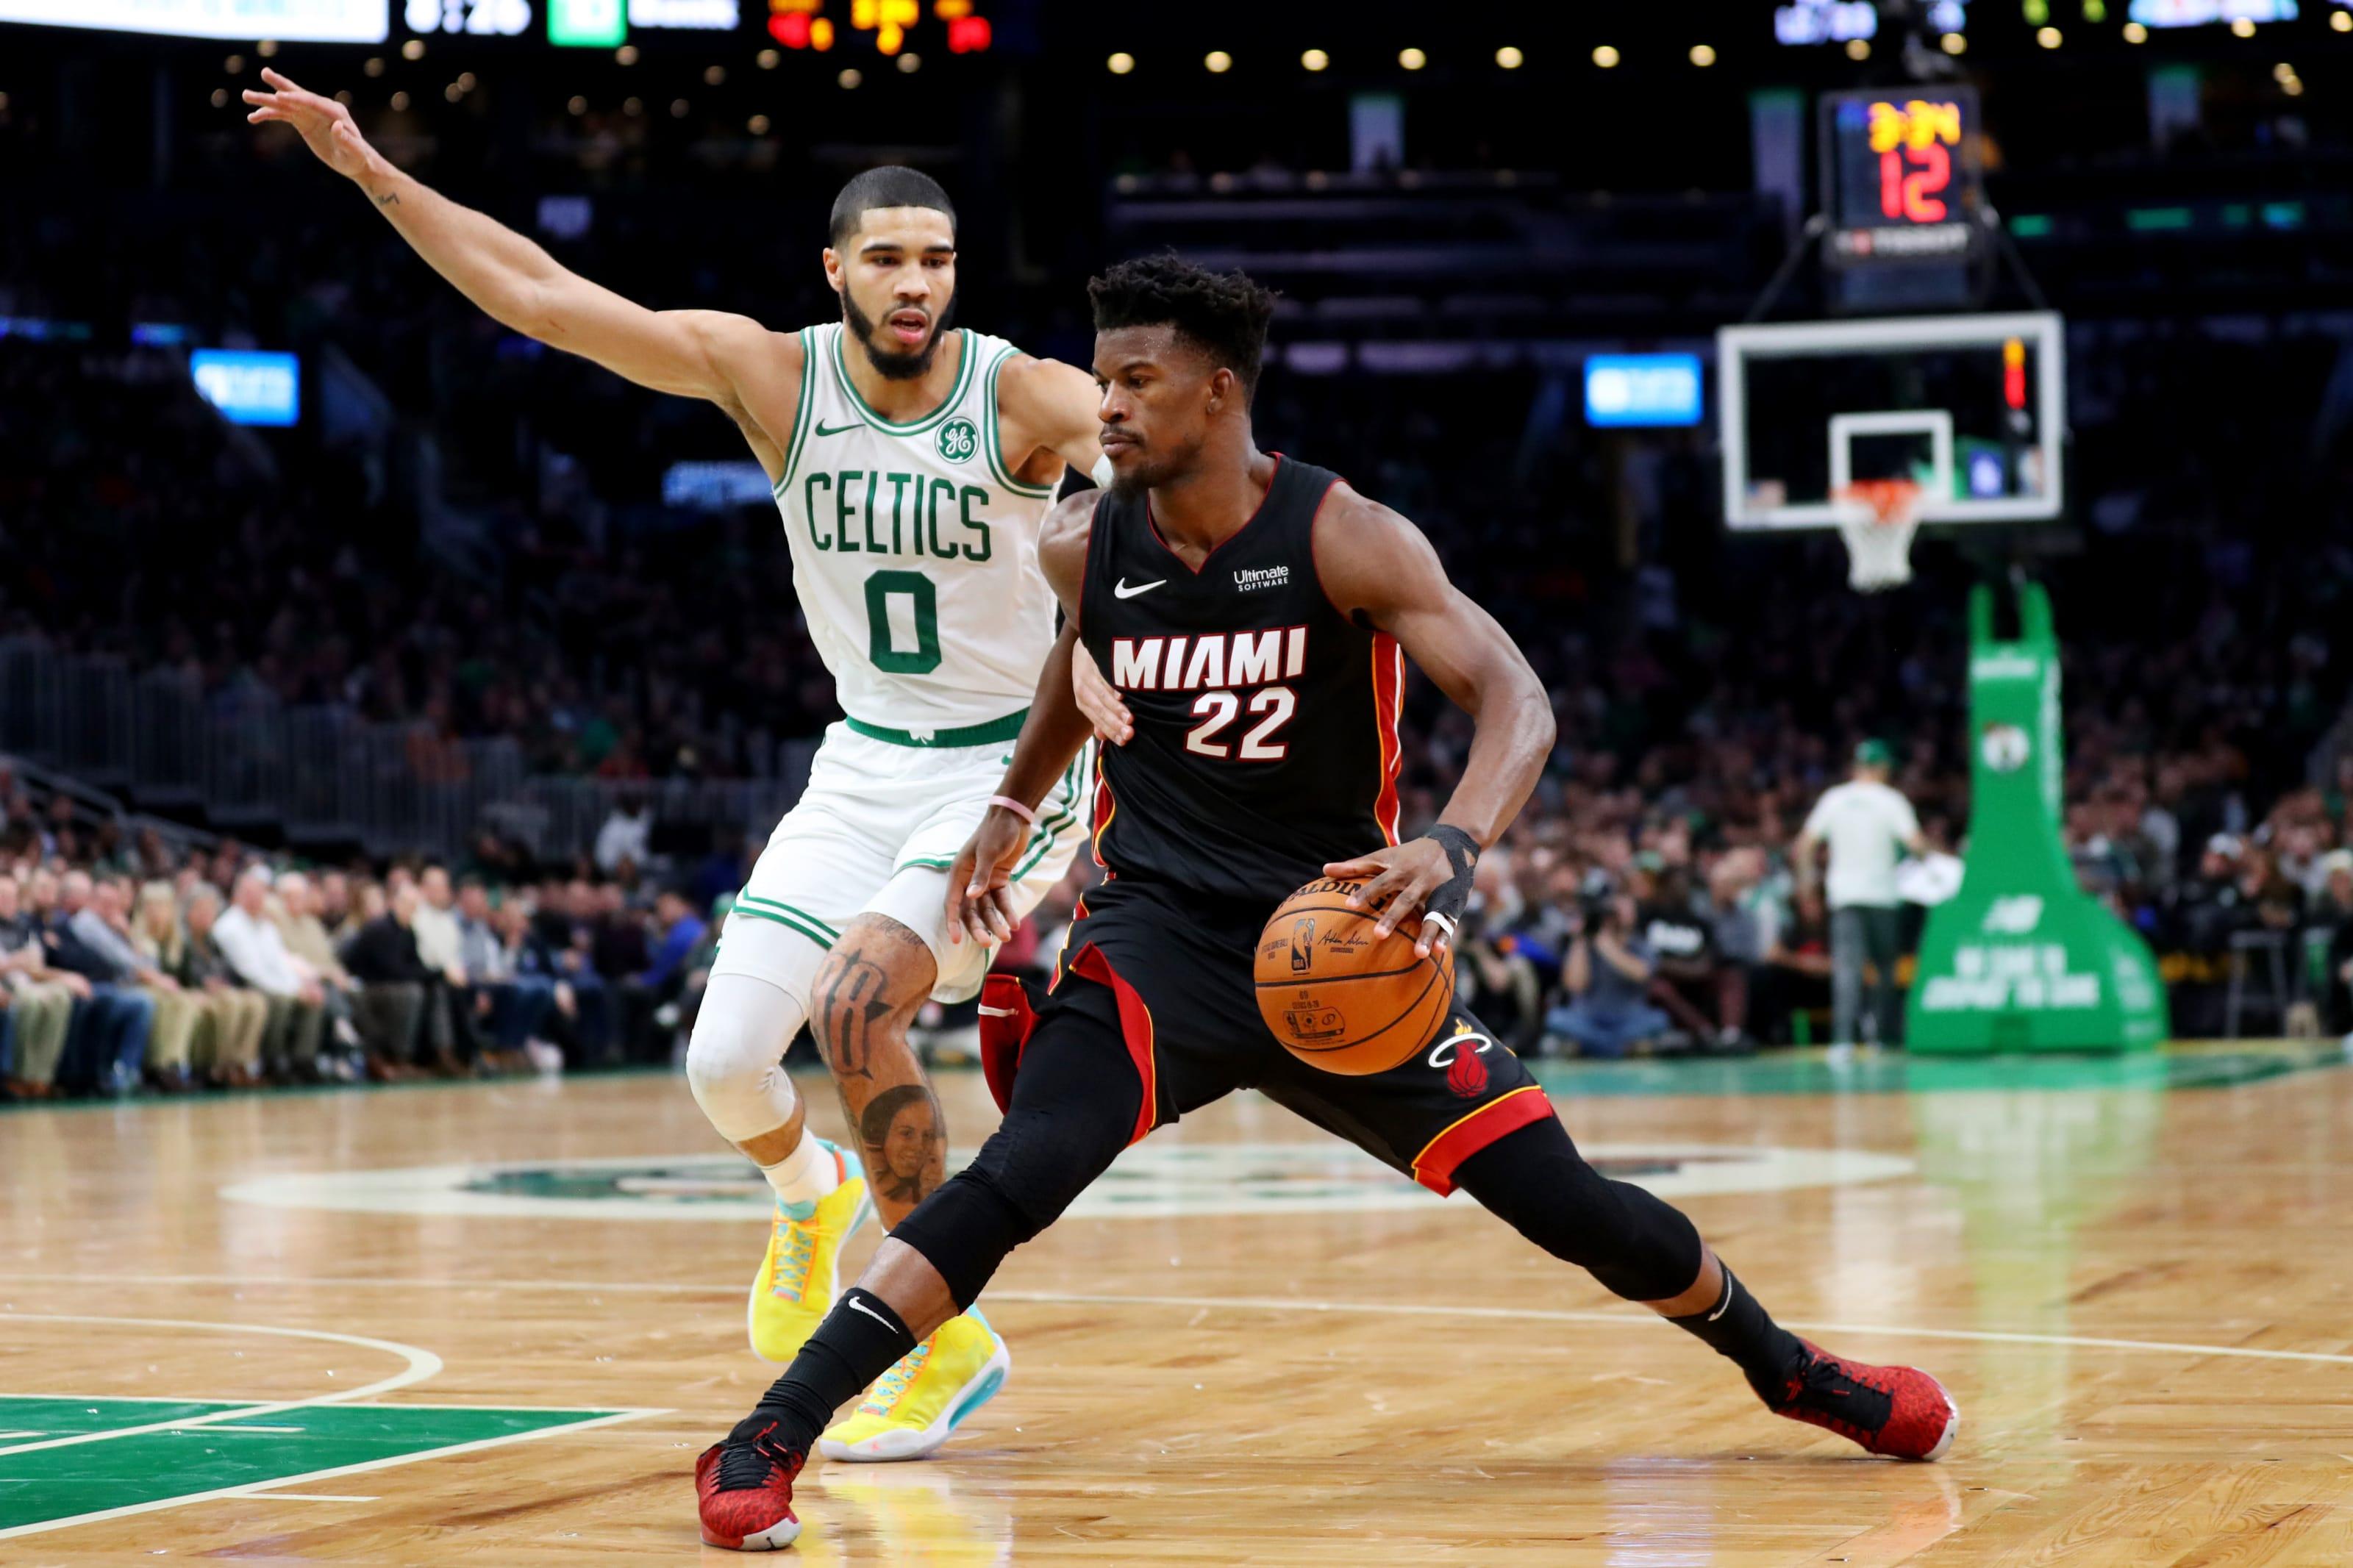 Boston Celtics: Ranking Jayson Tatum among the top NBA small forwards - Page 2